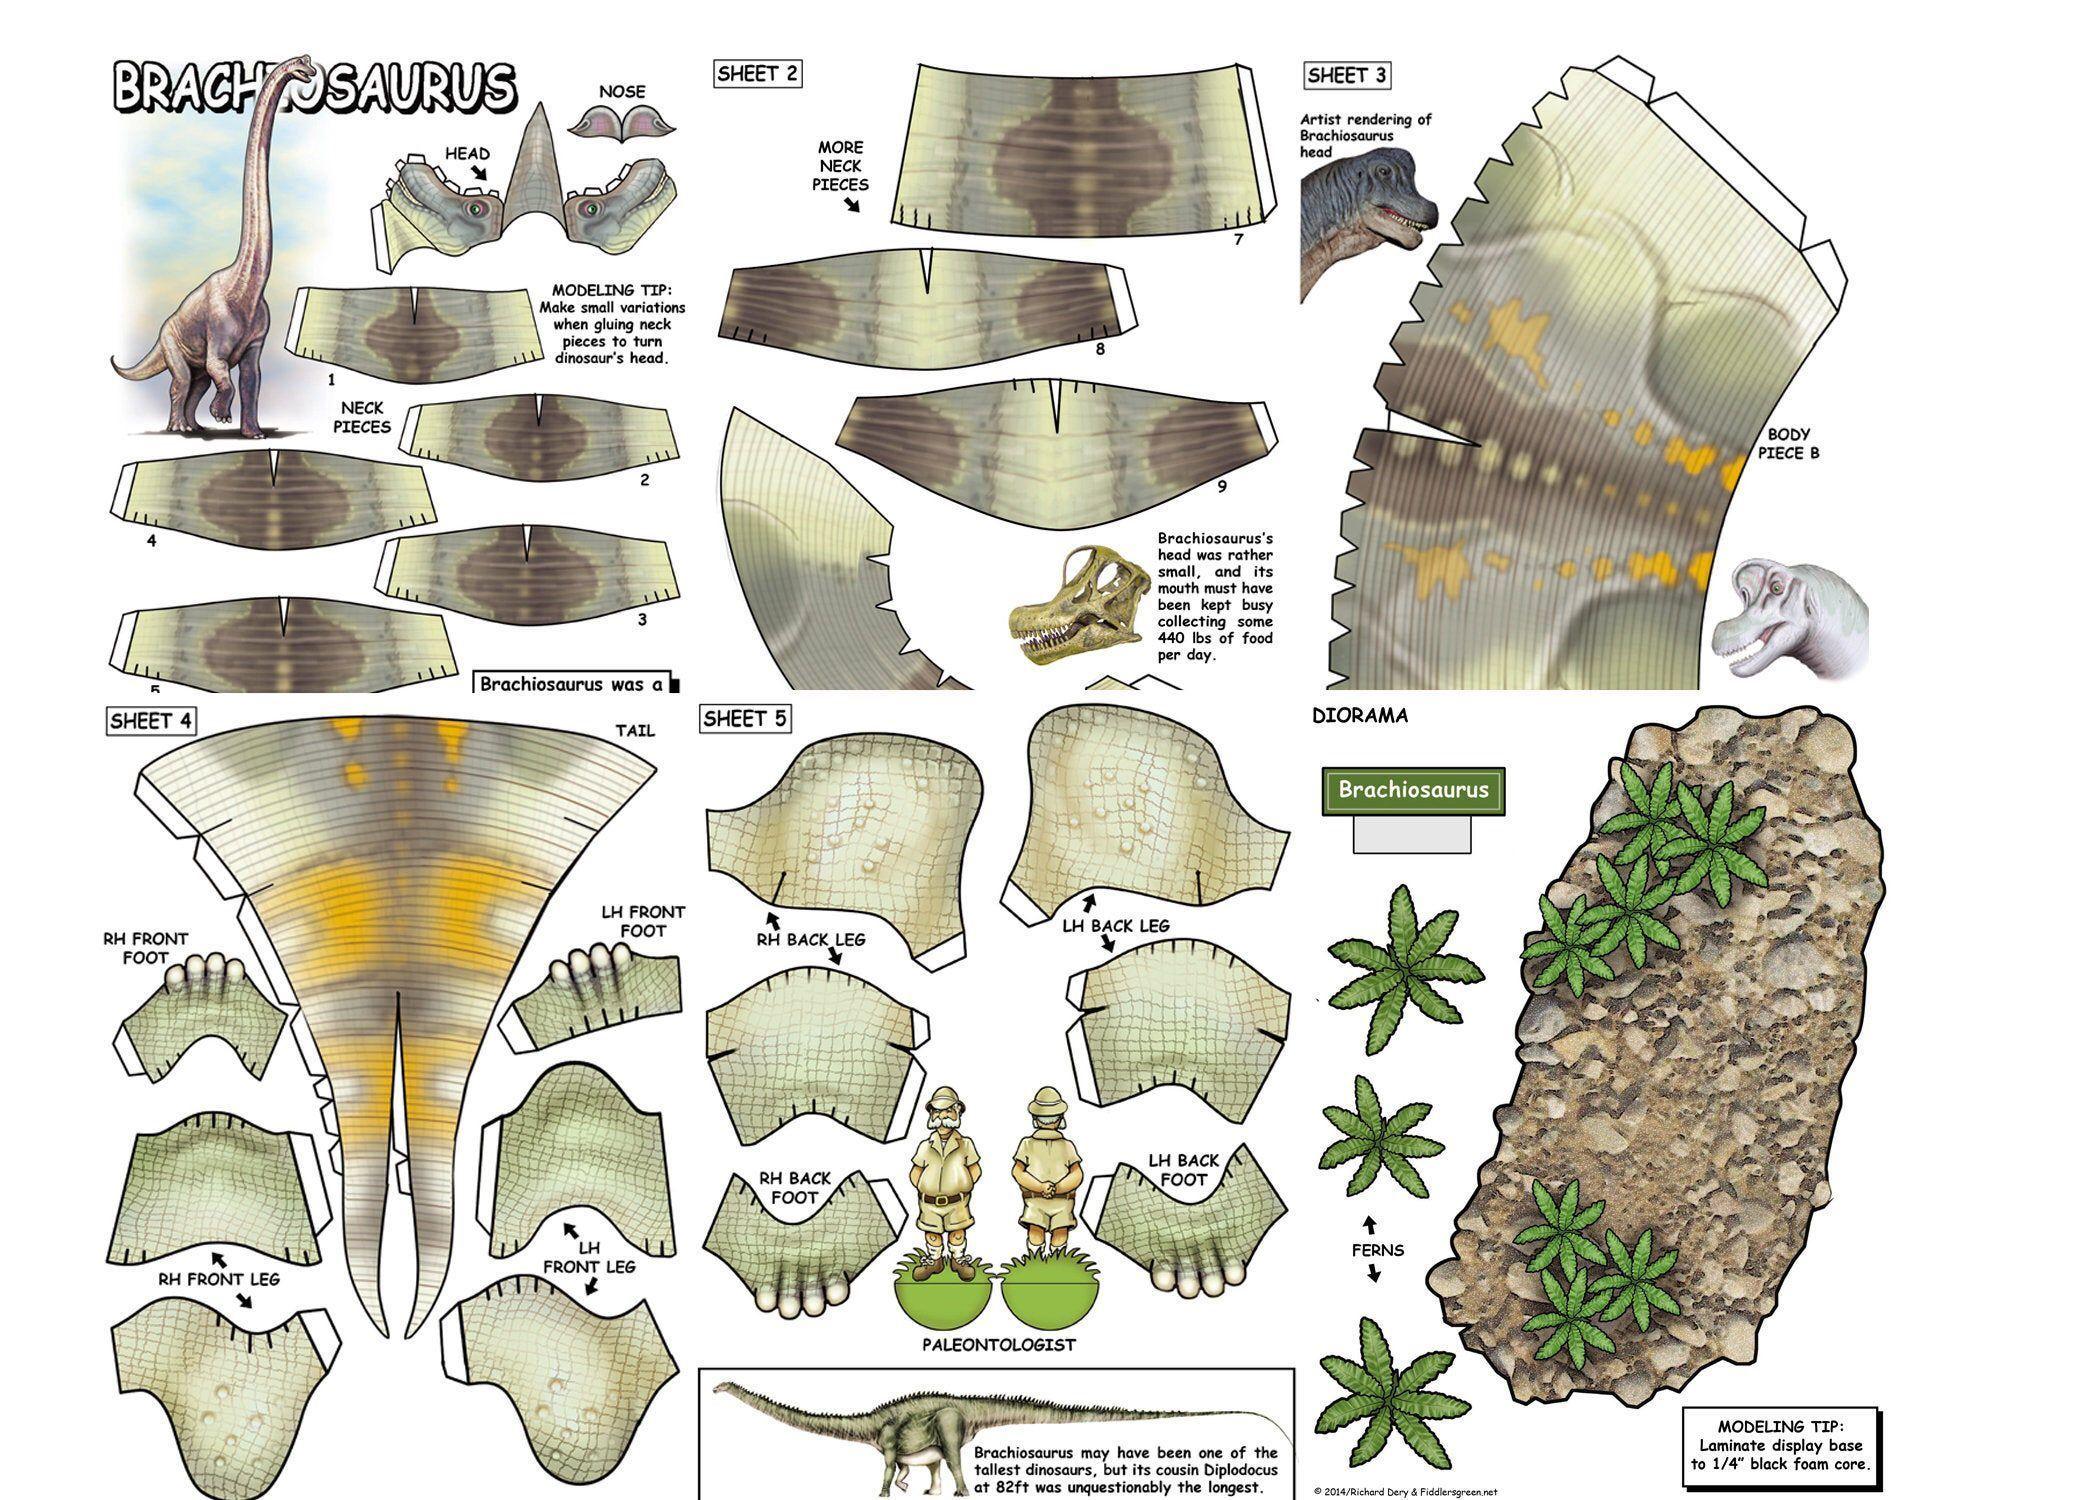 Paper dinosaur model, papercraft dinosaur, Brontosaurus #historyofdinosaurs Excited to share this item from my #etsy shop: Paper dinosaur model, papercraft dinosaur, Brontosaurus #historyofdinosaurs Paper dinosaur model, papercraft dinosaur, Brontosaurus #historyofdinosaurs Excited to share this item from my #etsy shop: Paper dinosaur model, papercraft dinosaur, Brontosaurus #historyofdinosaurs